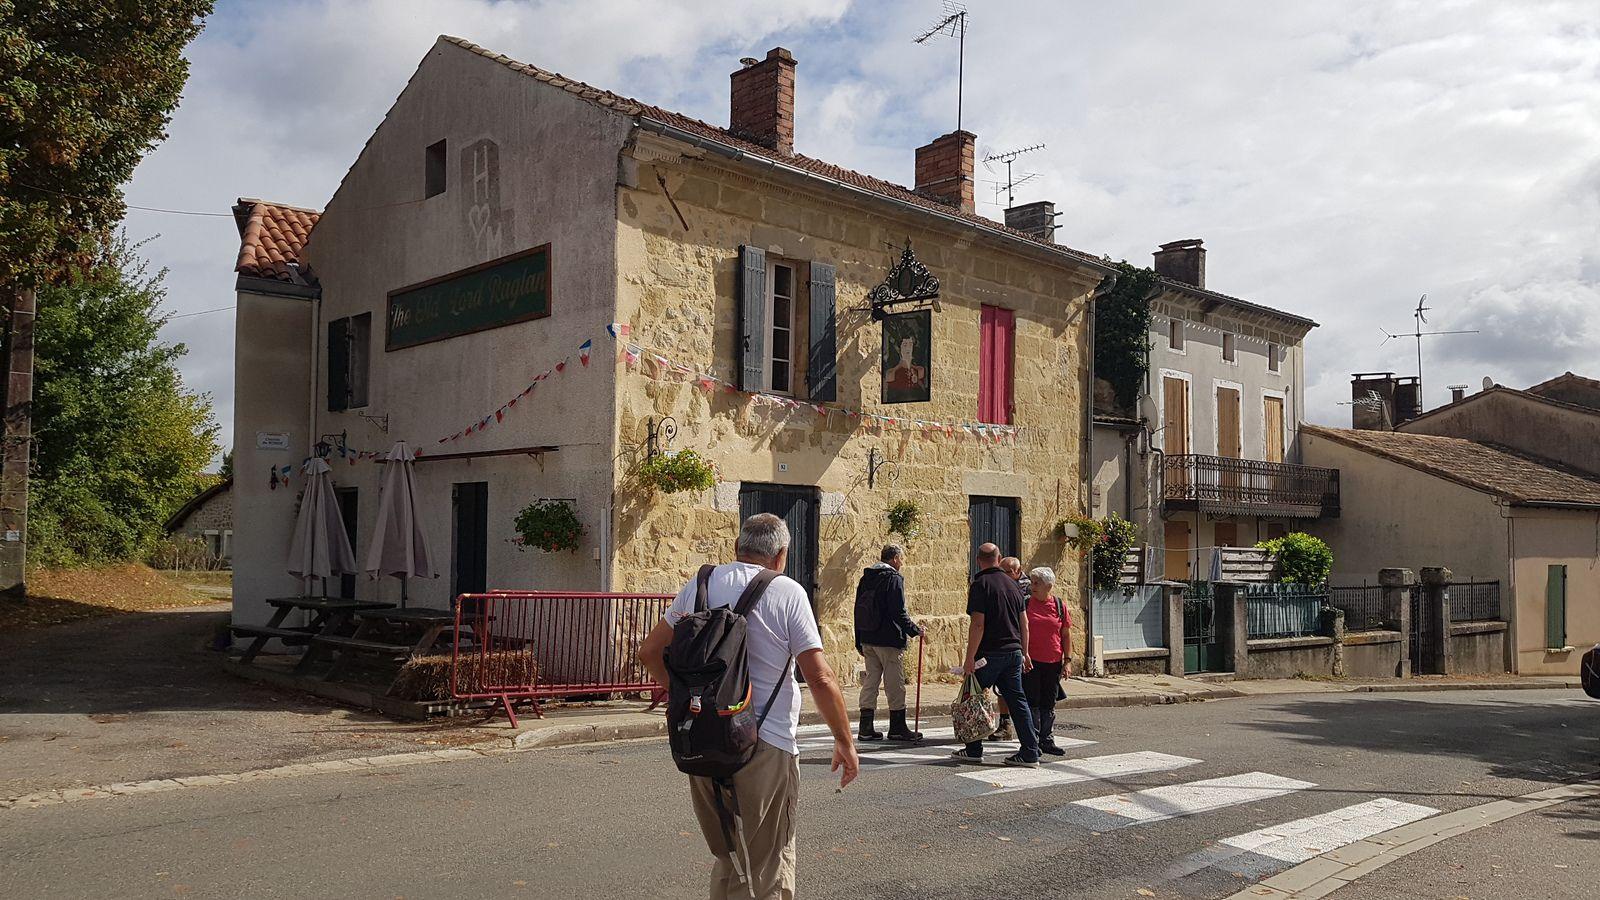 Montignac de Lauzun